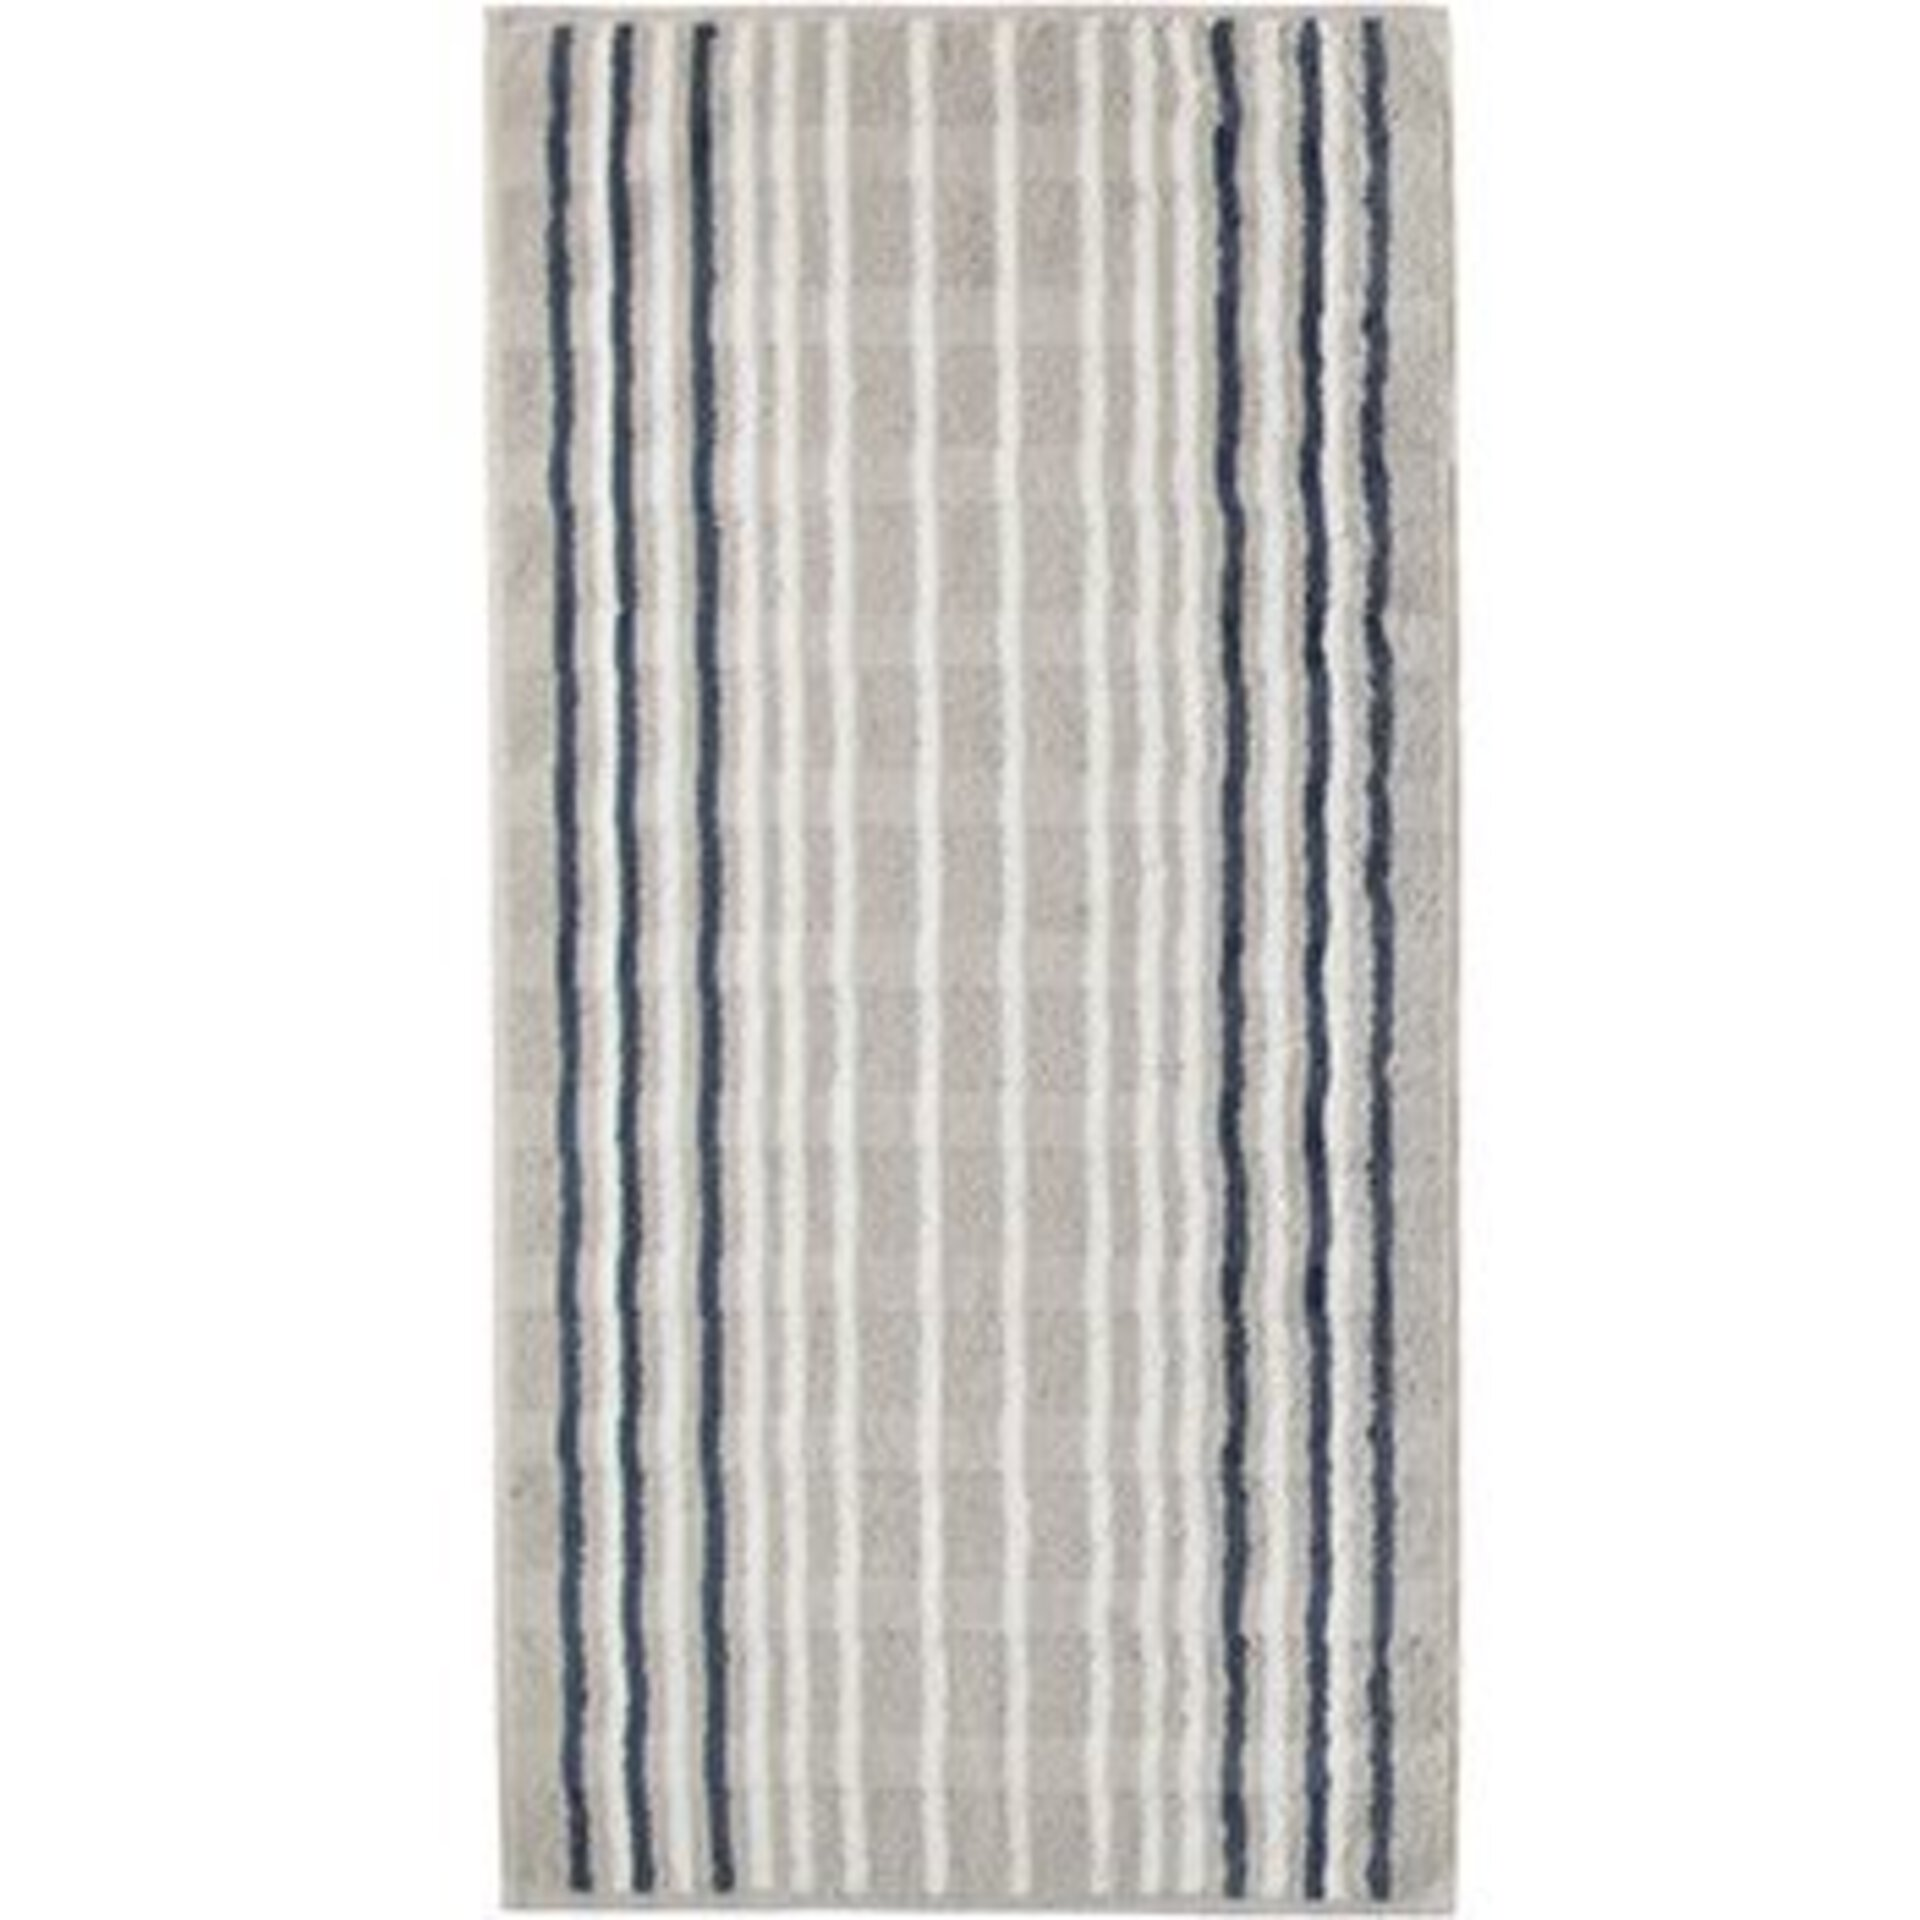 Handtuch Cawö Textil grau 50 x 100 cm